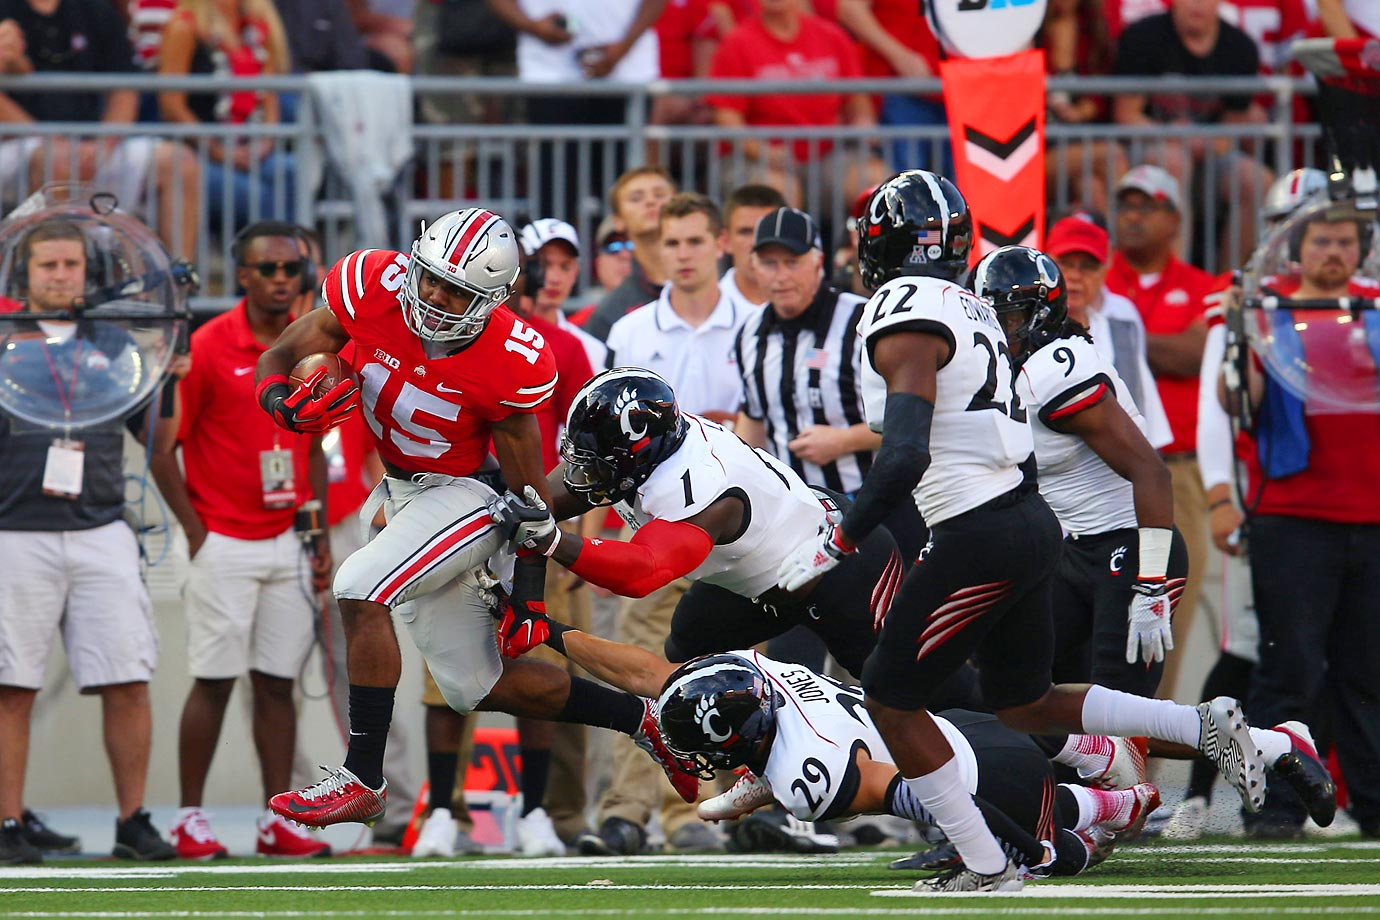 Cincinnati Bearcats defenders try to stop Ohio State running back Ezekiel Elliott.